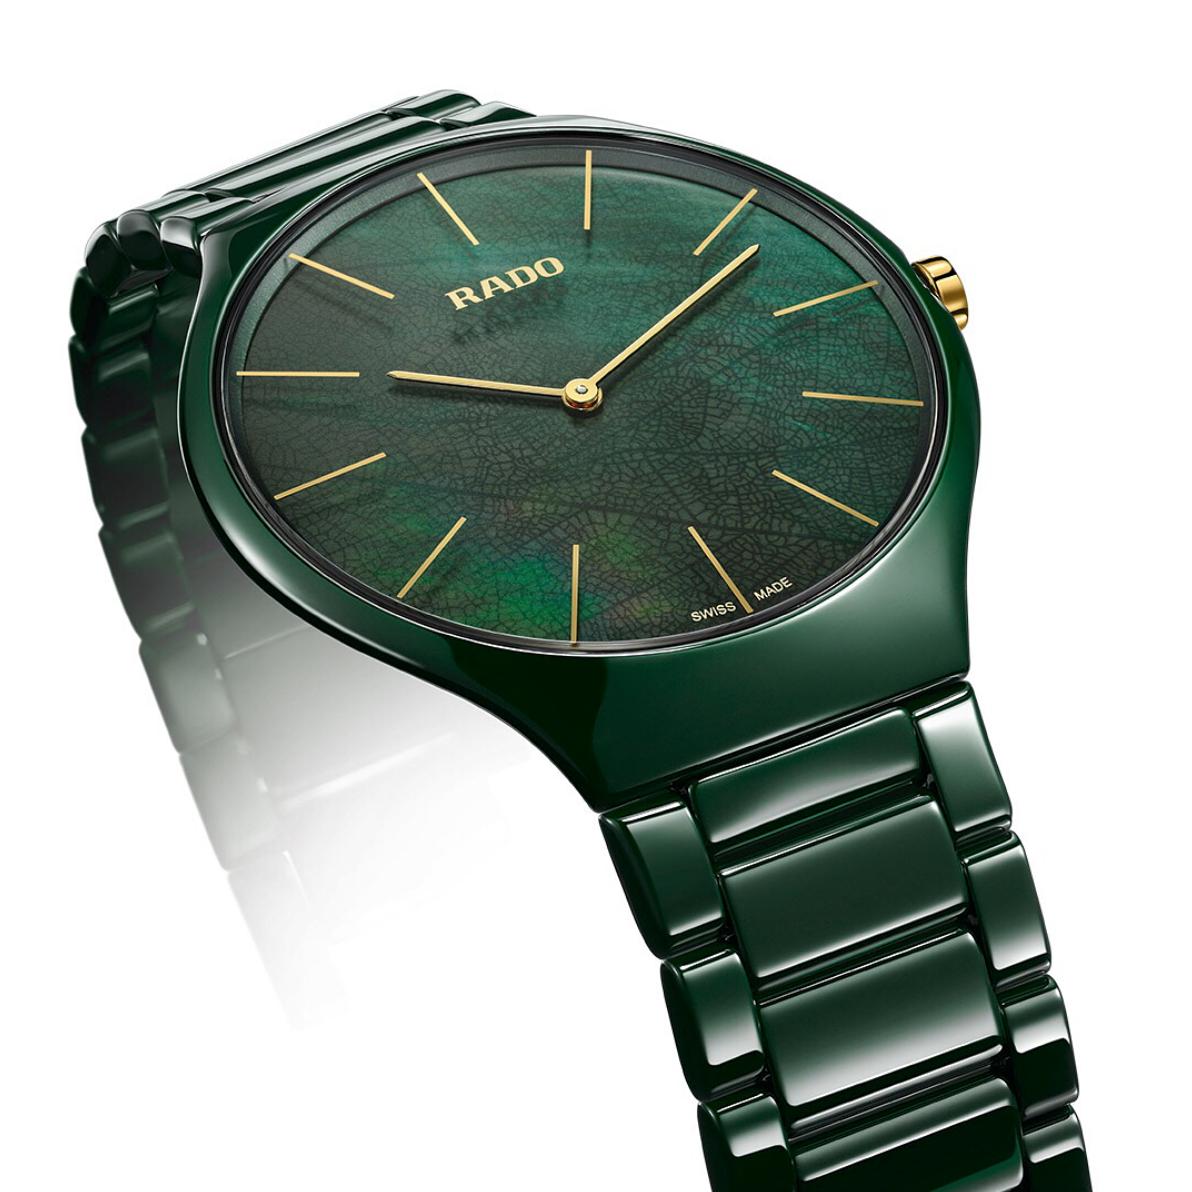 【RADO ラドー】True Thinline Leaf トゥルーシンライン(リーフグリーン)/国内正規品 腕時計